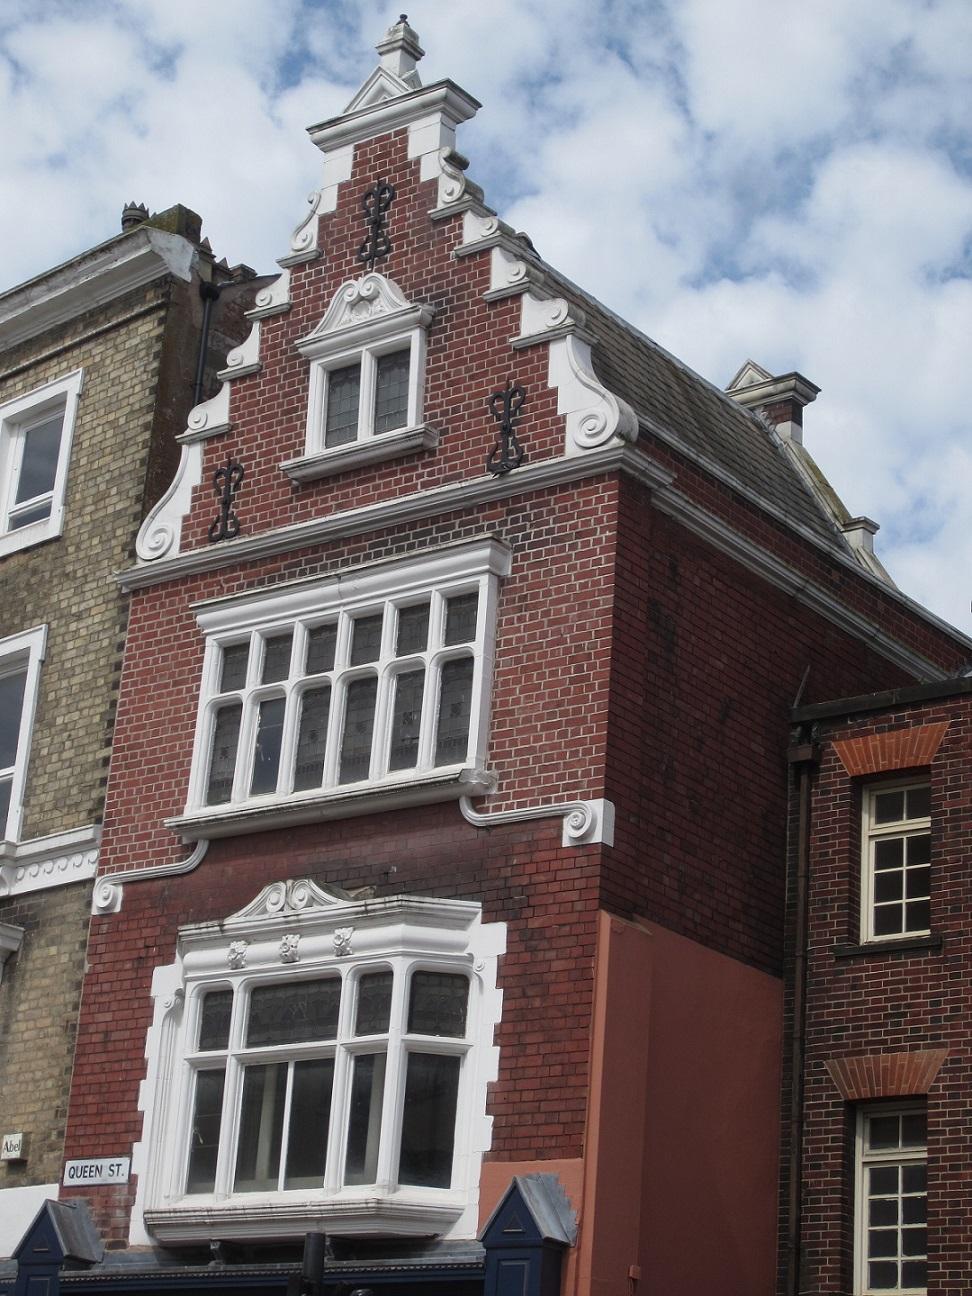 Queen street building façade